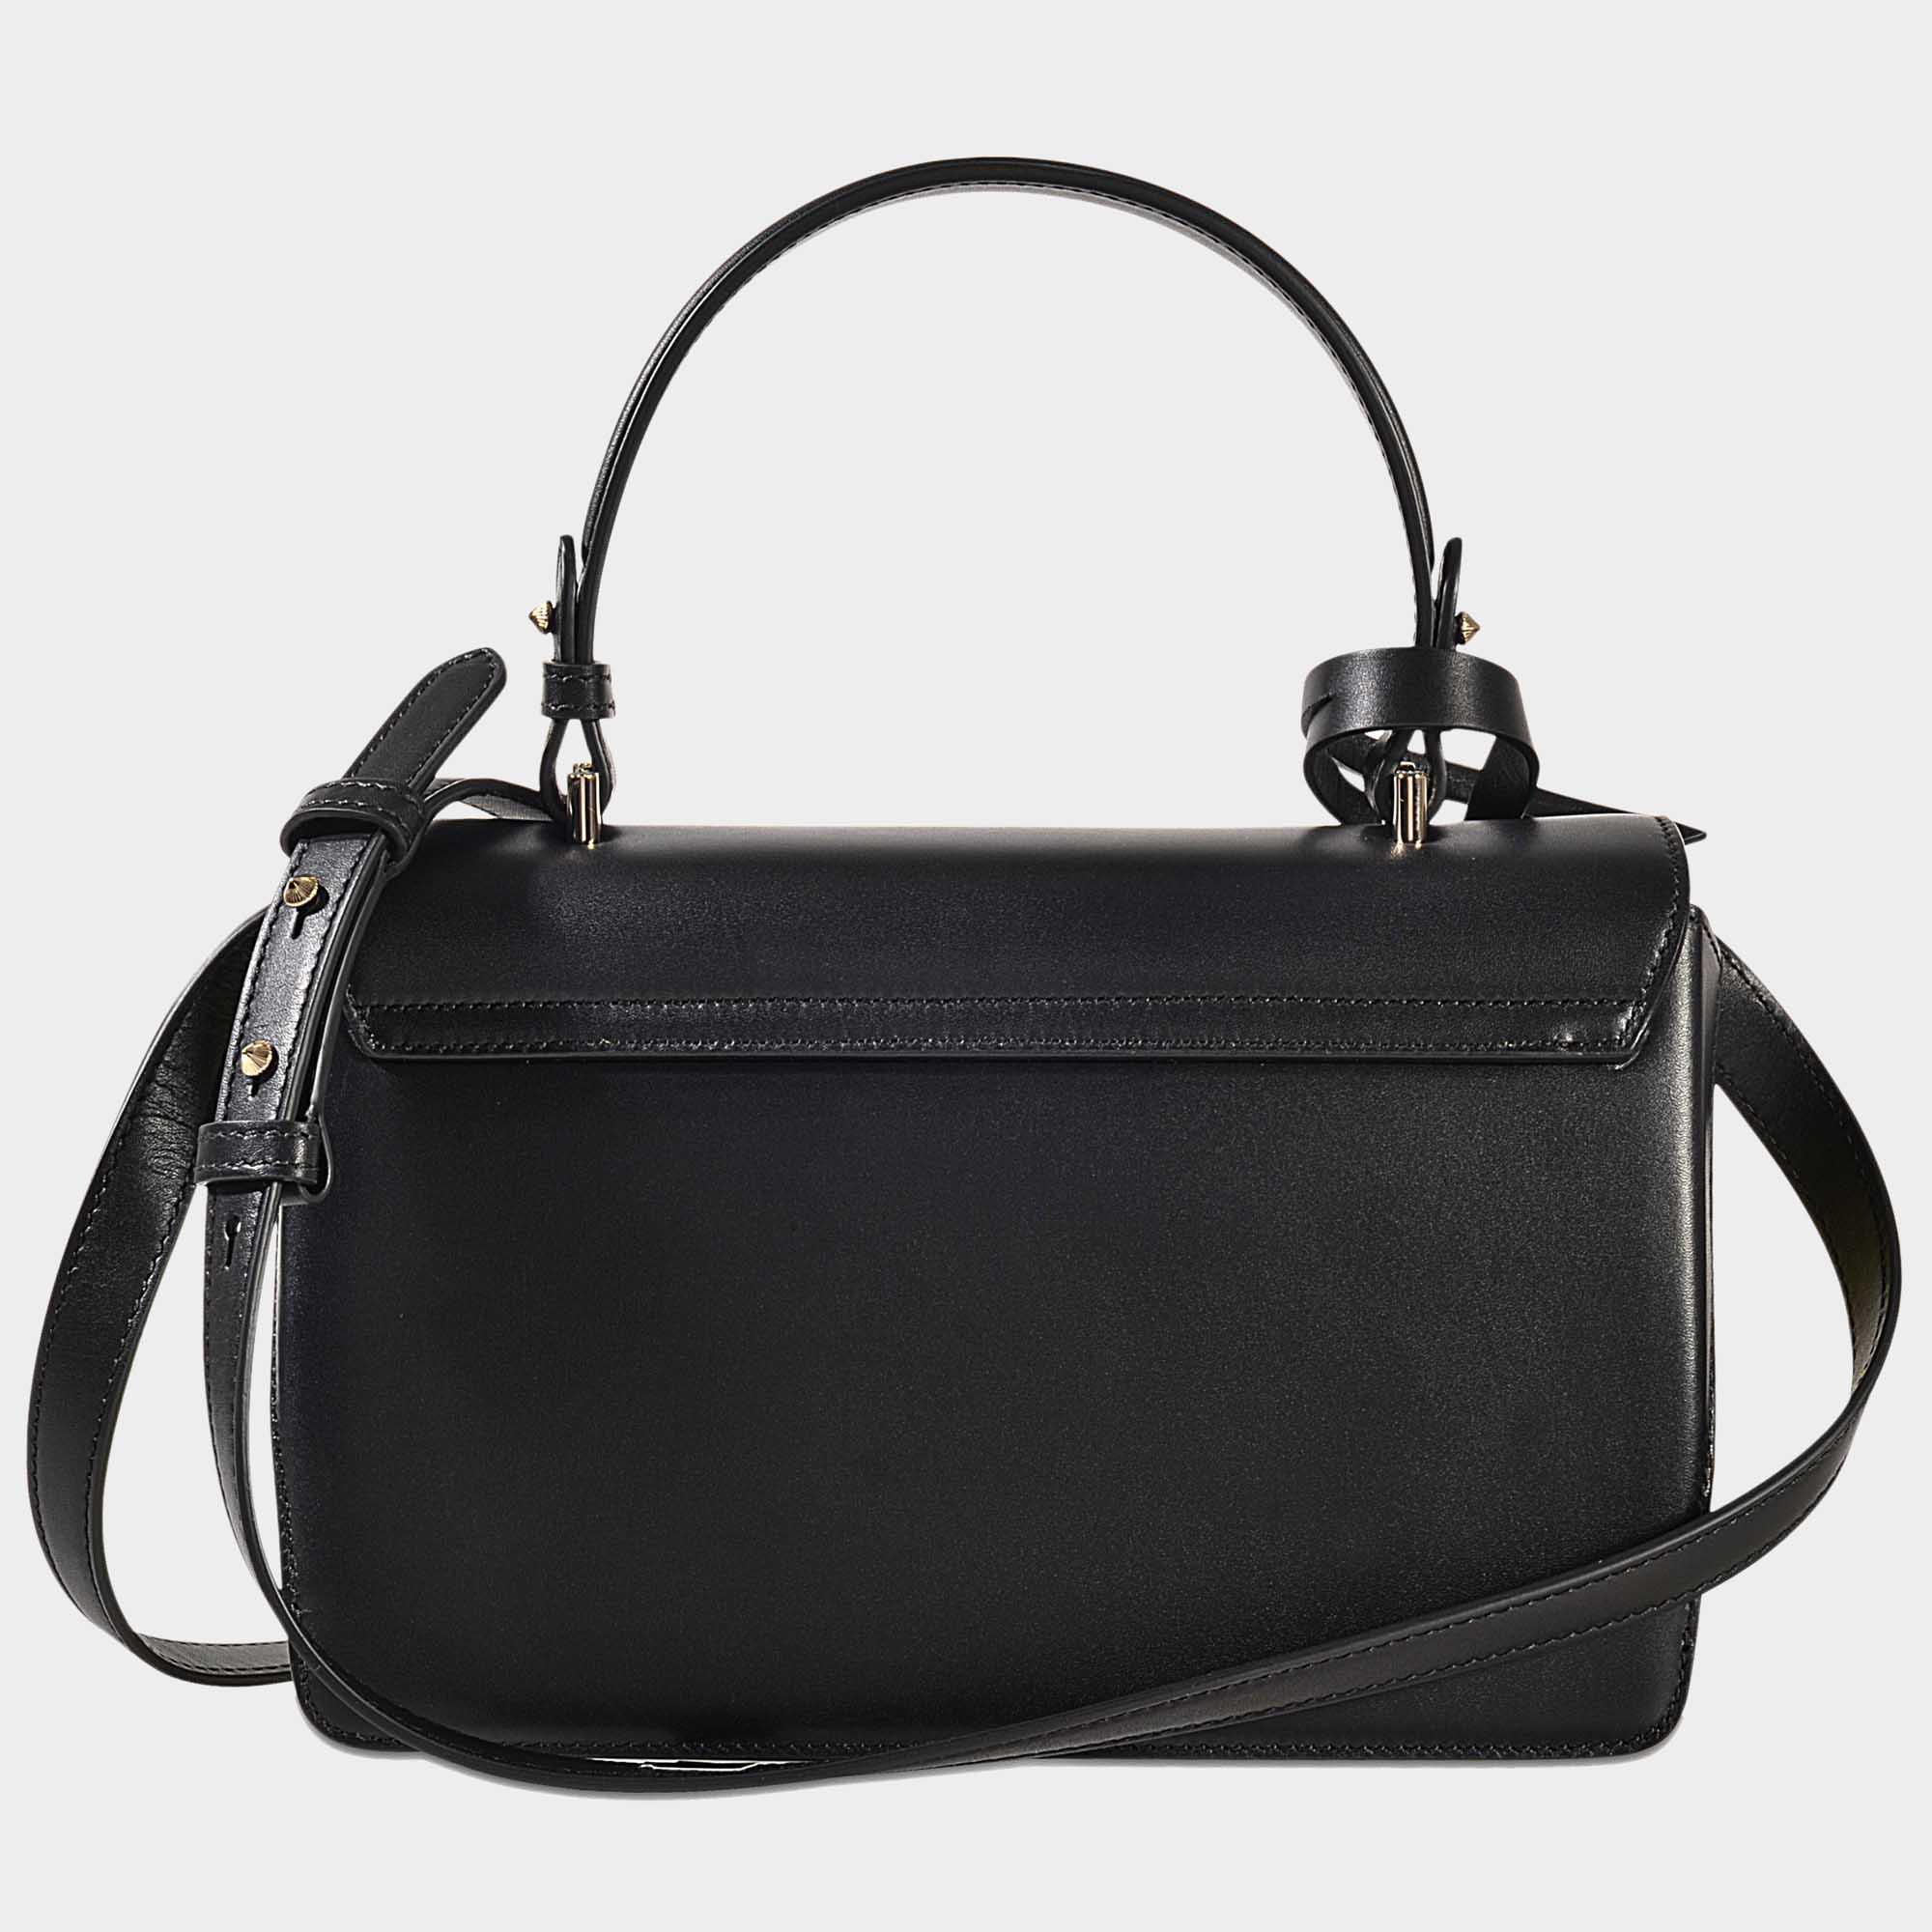 aea0993a065 ... Calfskin Reebonz  new style 52026 7d0bb Lyst - Versace The Dv1 Small Handbag  Crossbody in Black ...